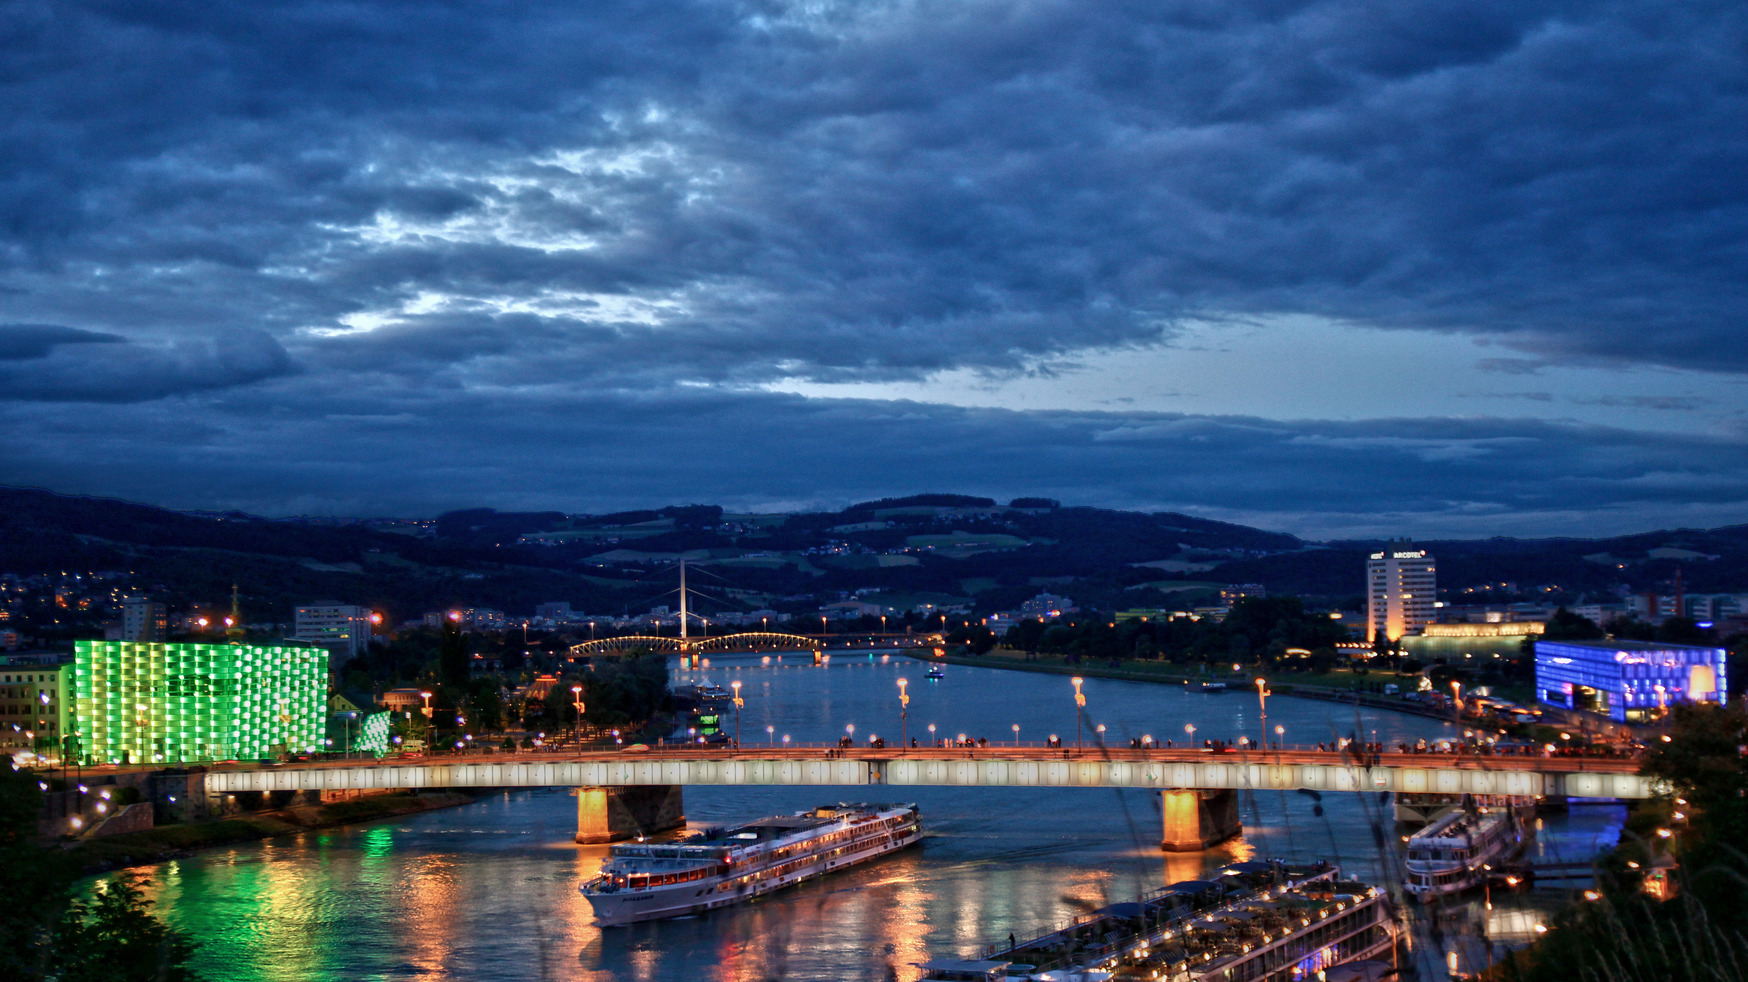 Panorama_Linz_2014©LinzTourismus_AlexSi